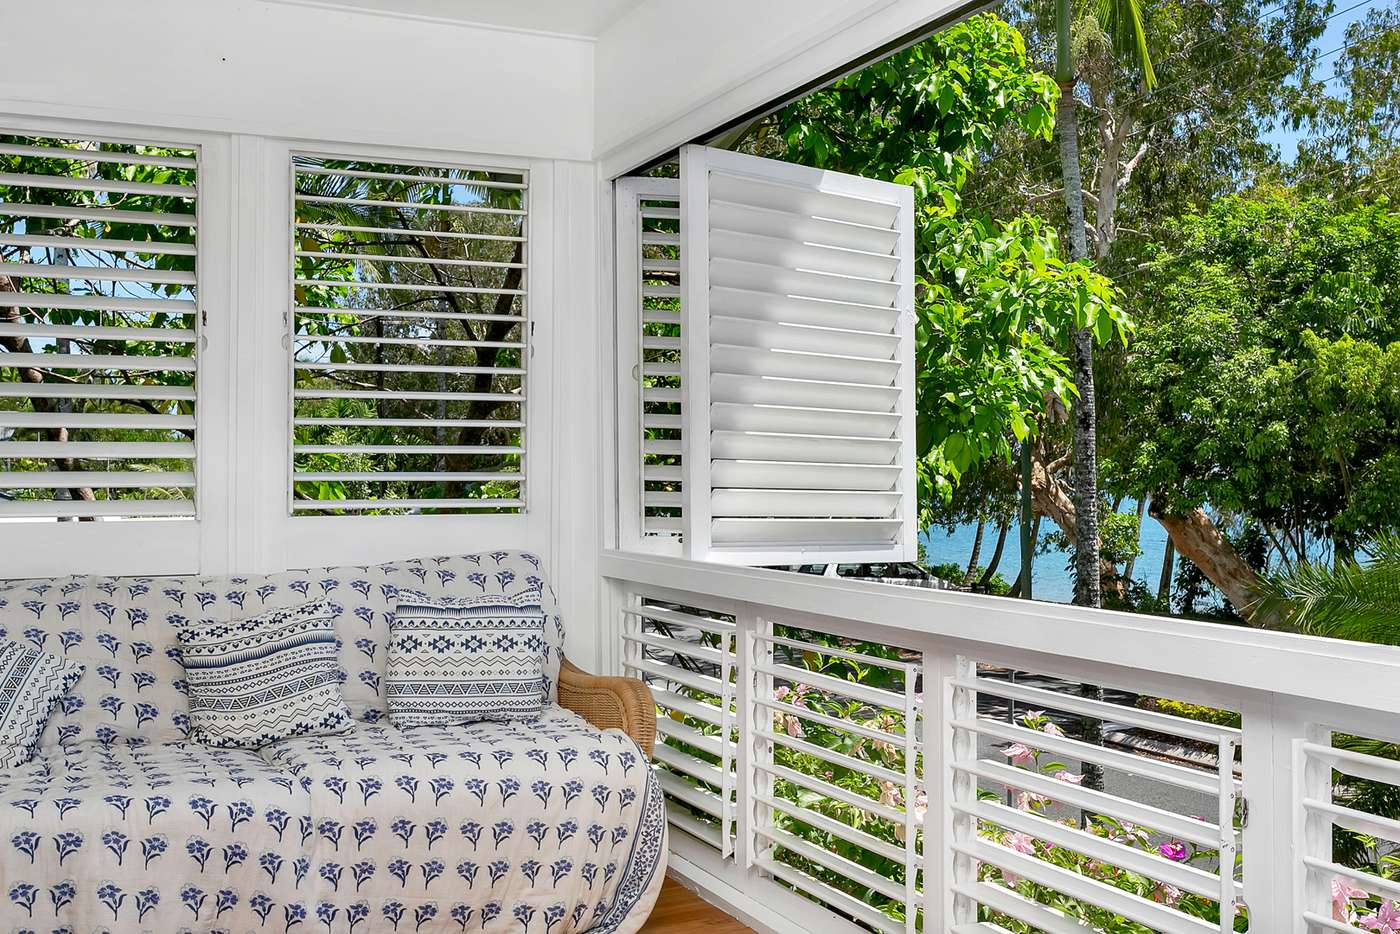 Main view of Homely house listing, 131 Arlington Esplanade, Clifton Beach QLD 4879